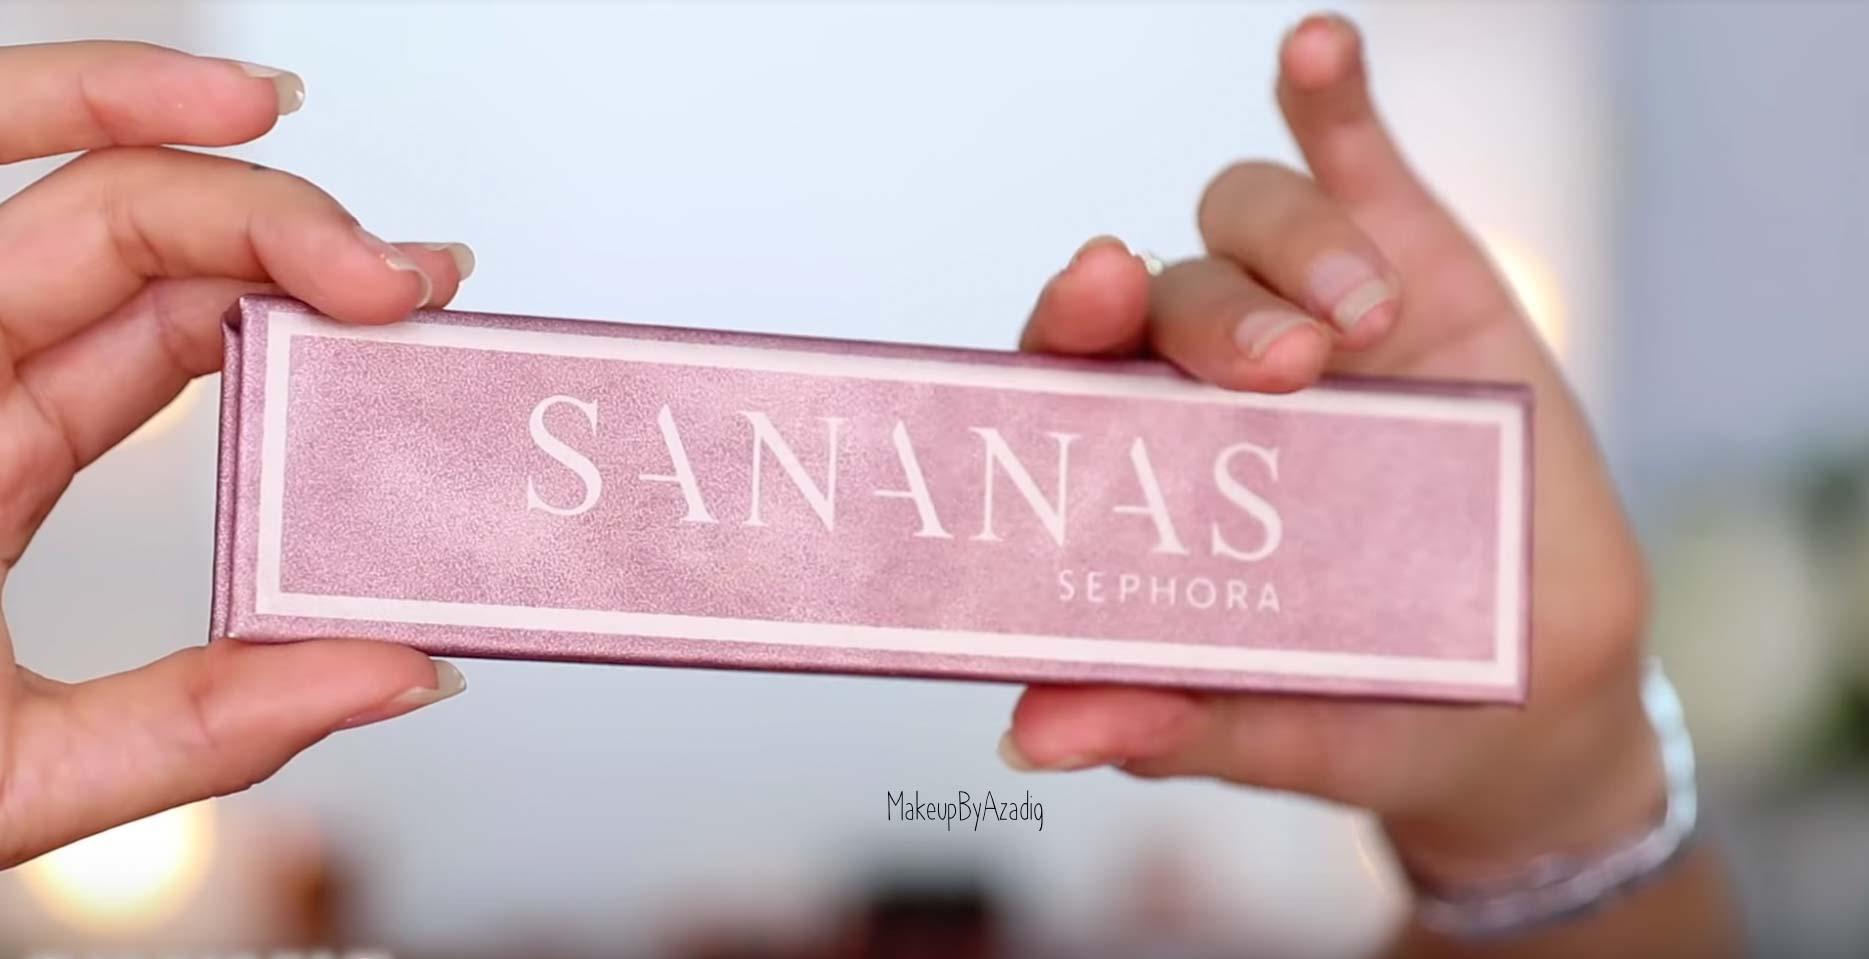 Capture d'écran provenant de la vidéo Youtube de Sananas